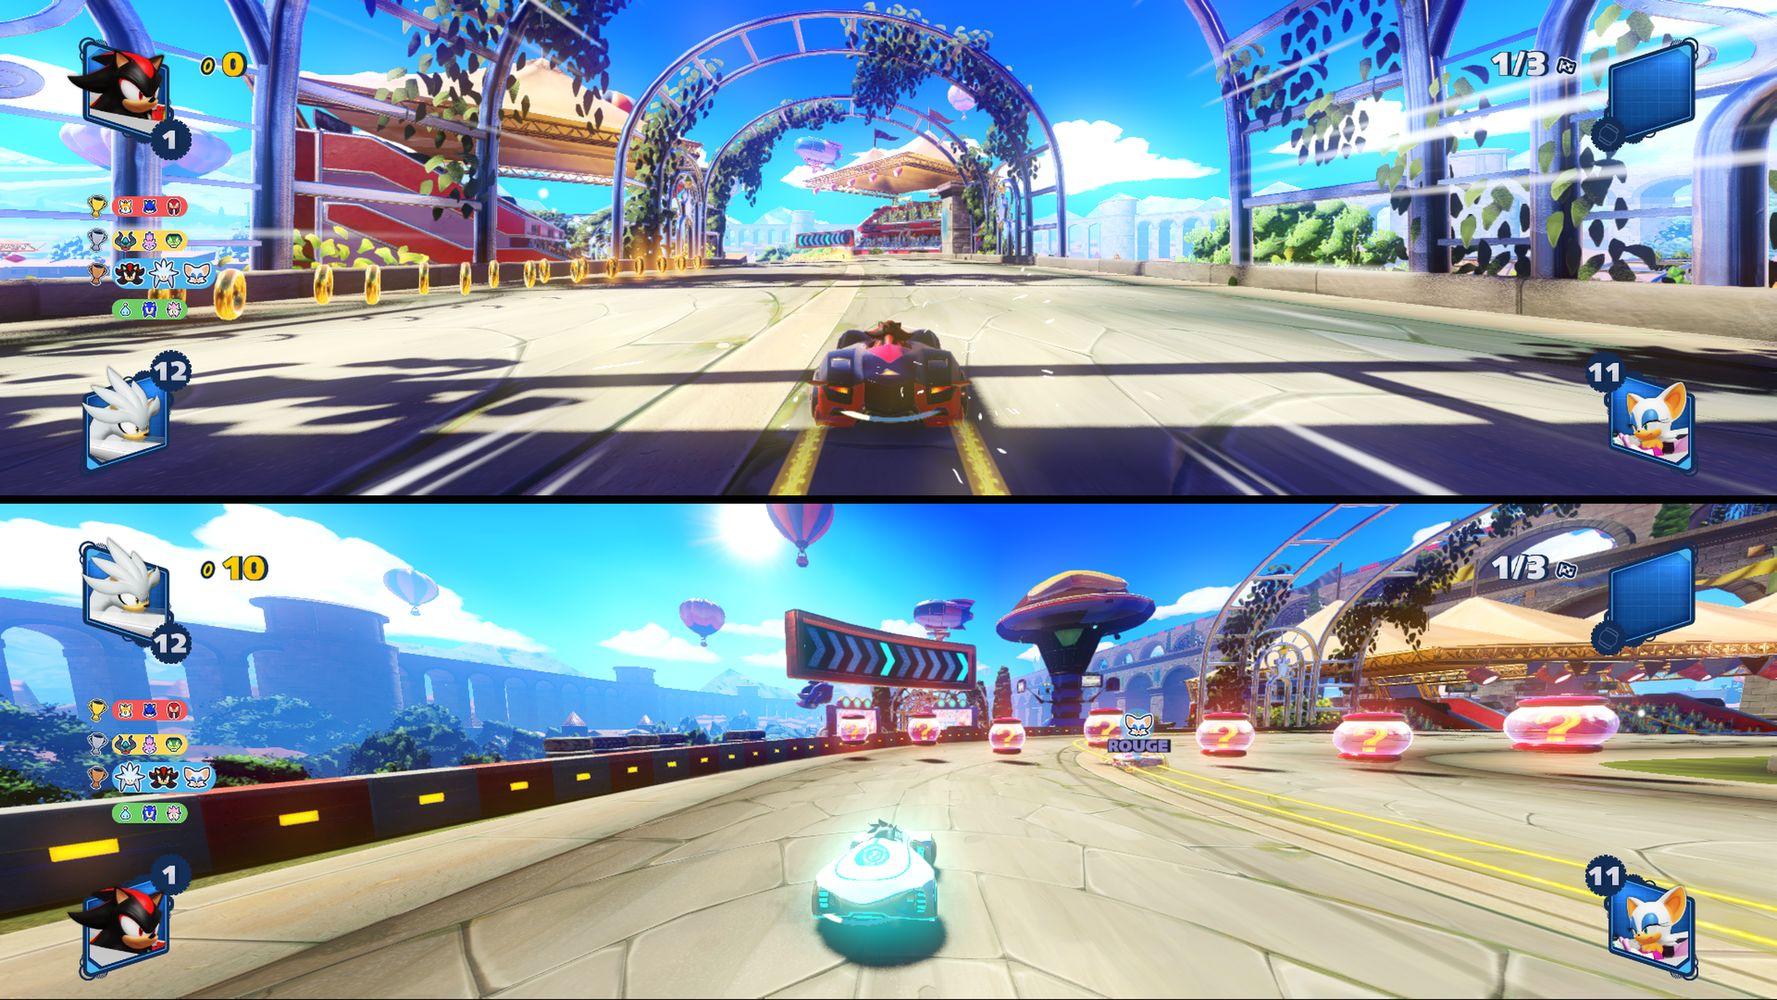 Gameplay in split screen